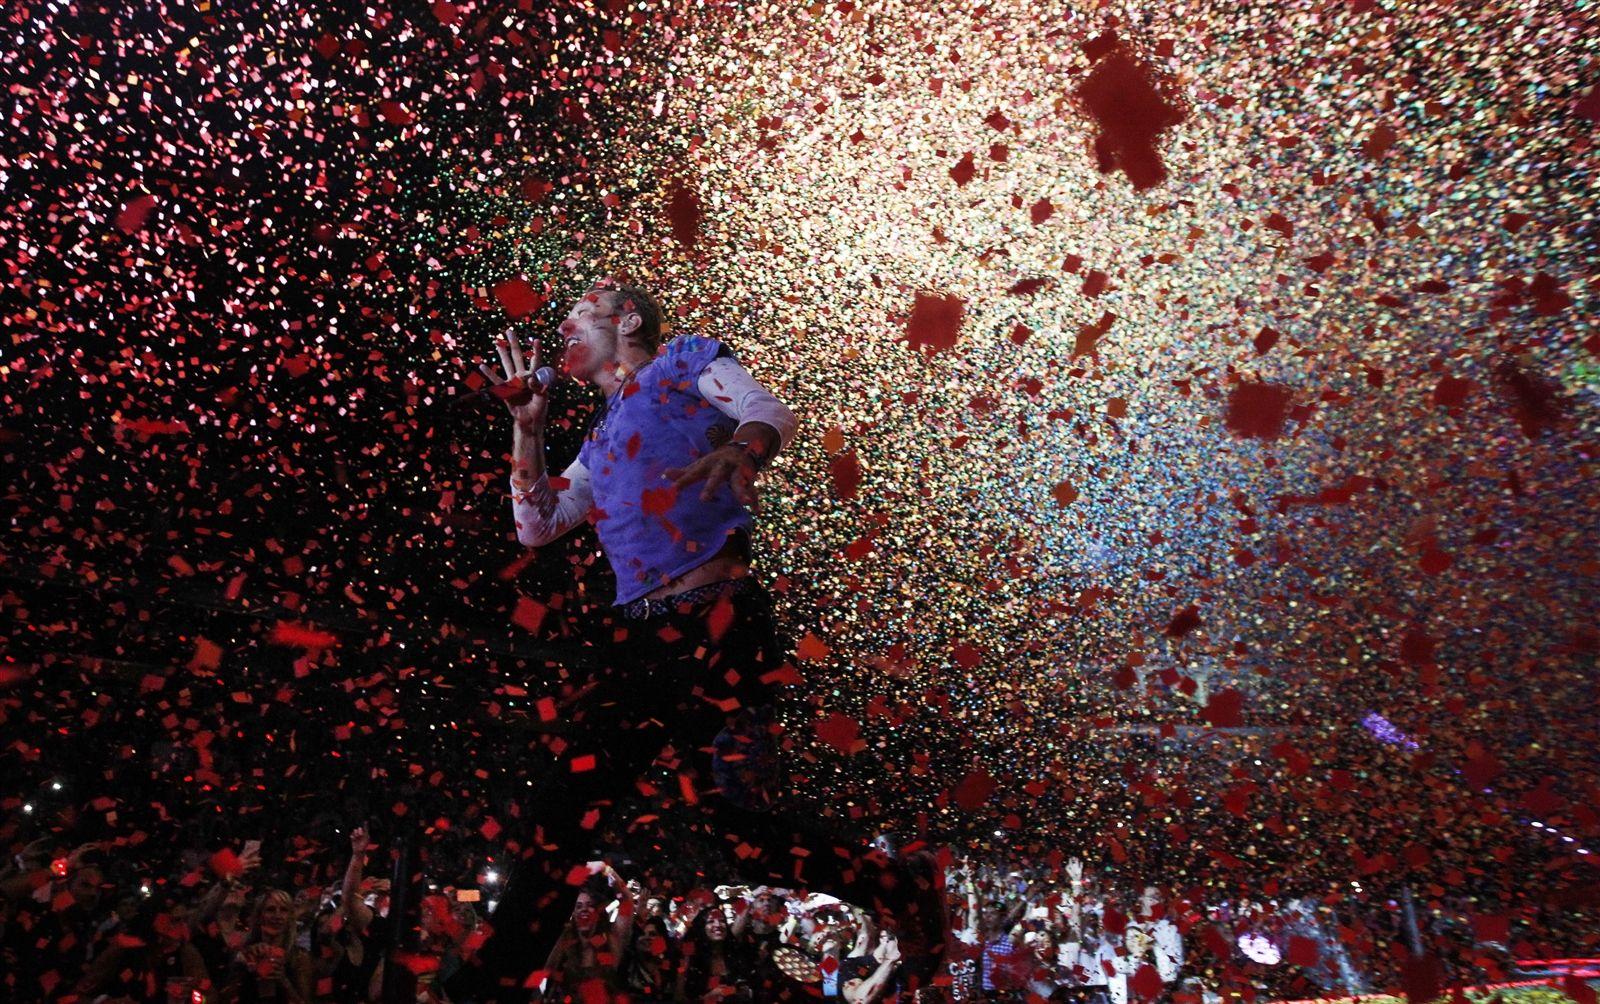 Frontman Chris Martin runs through confetti as it rains down on the audience.